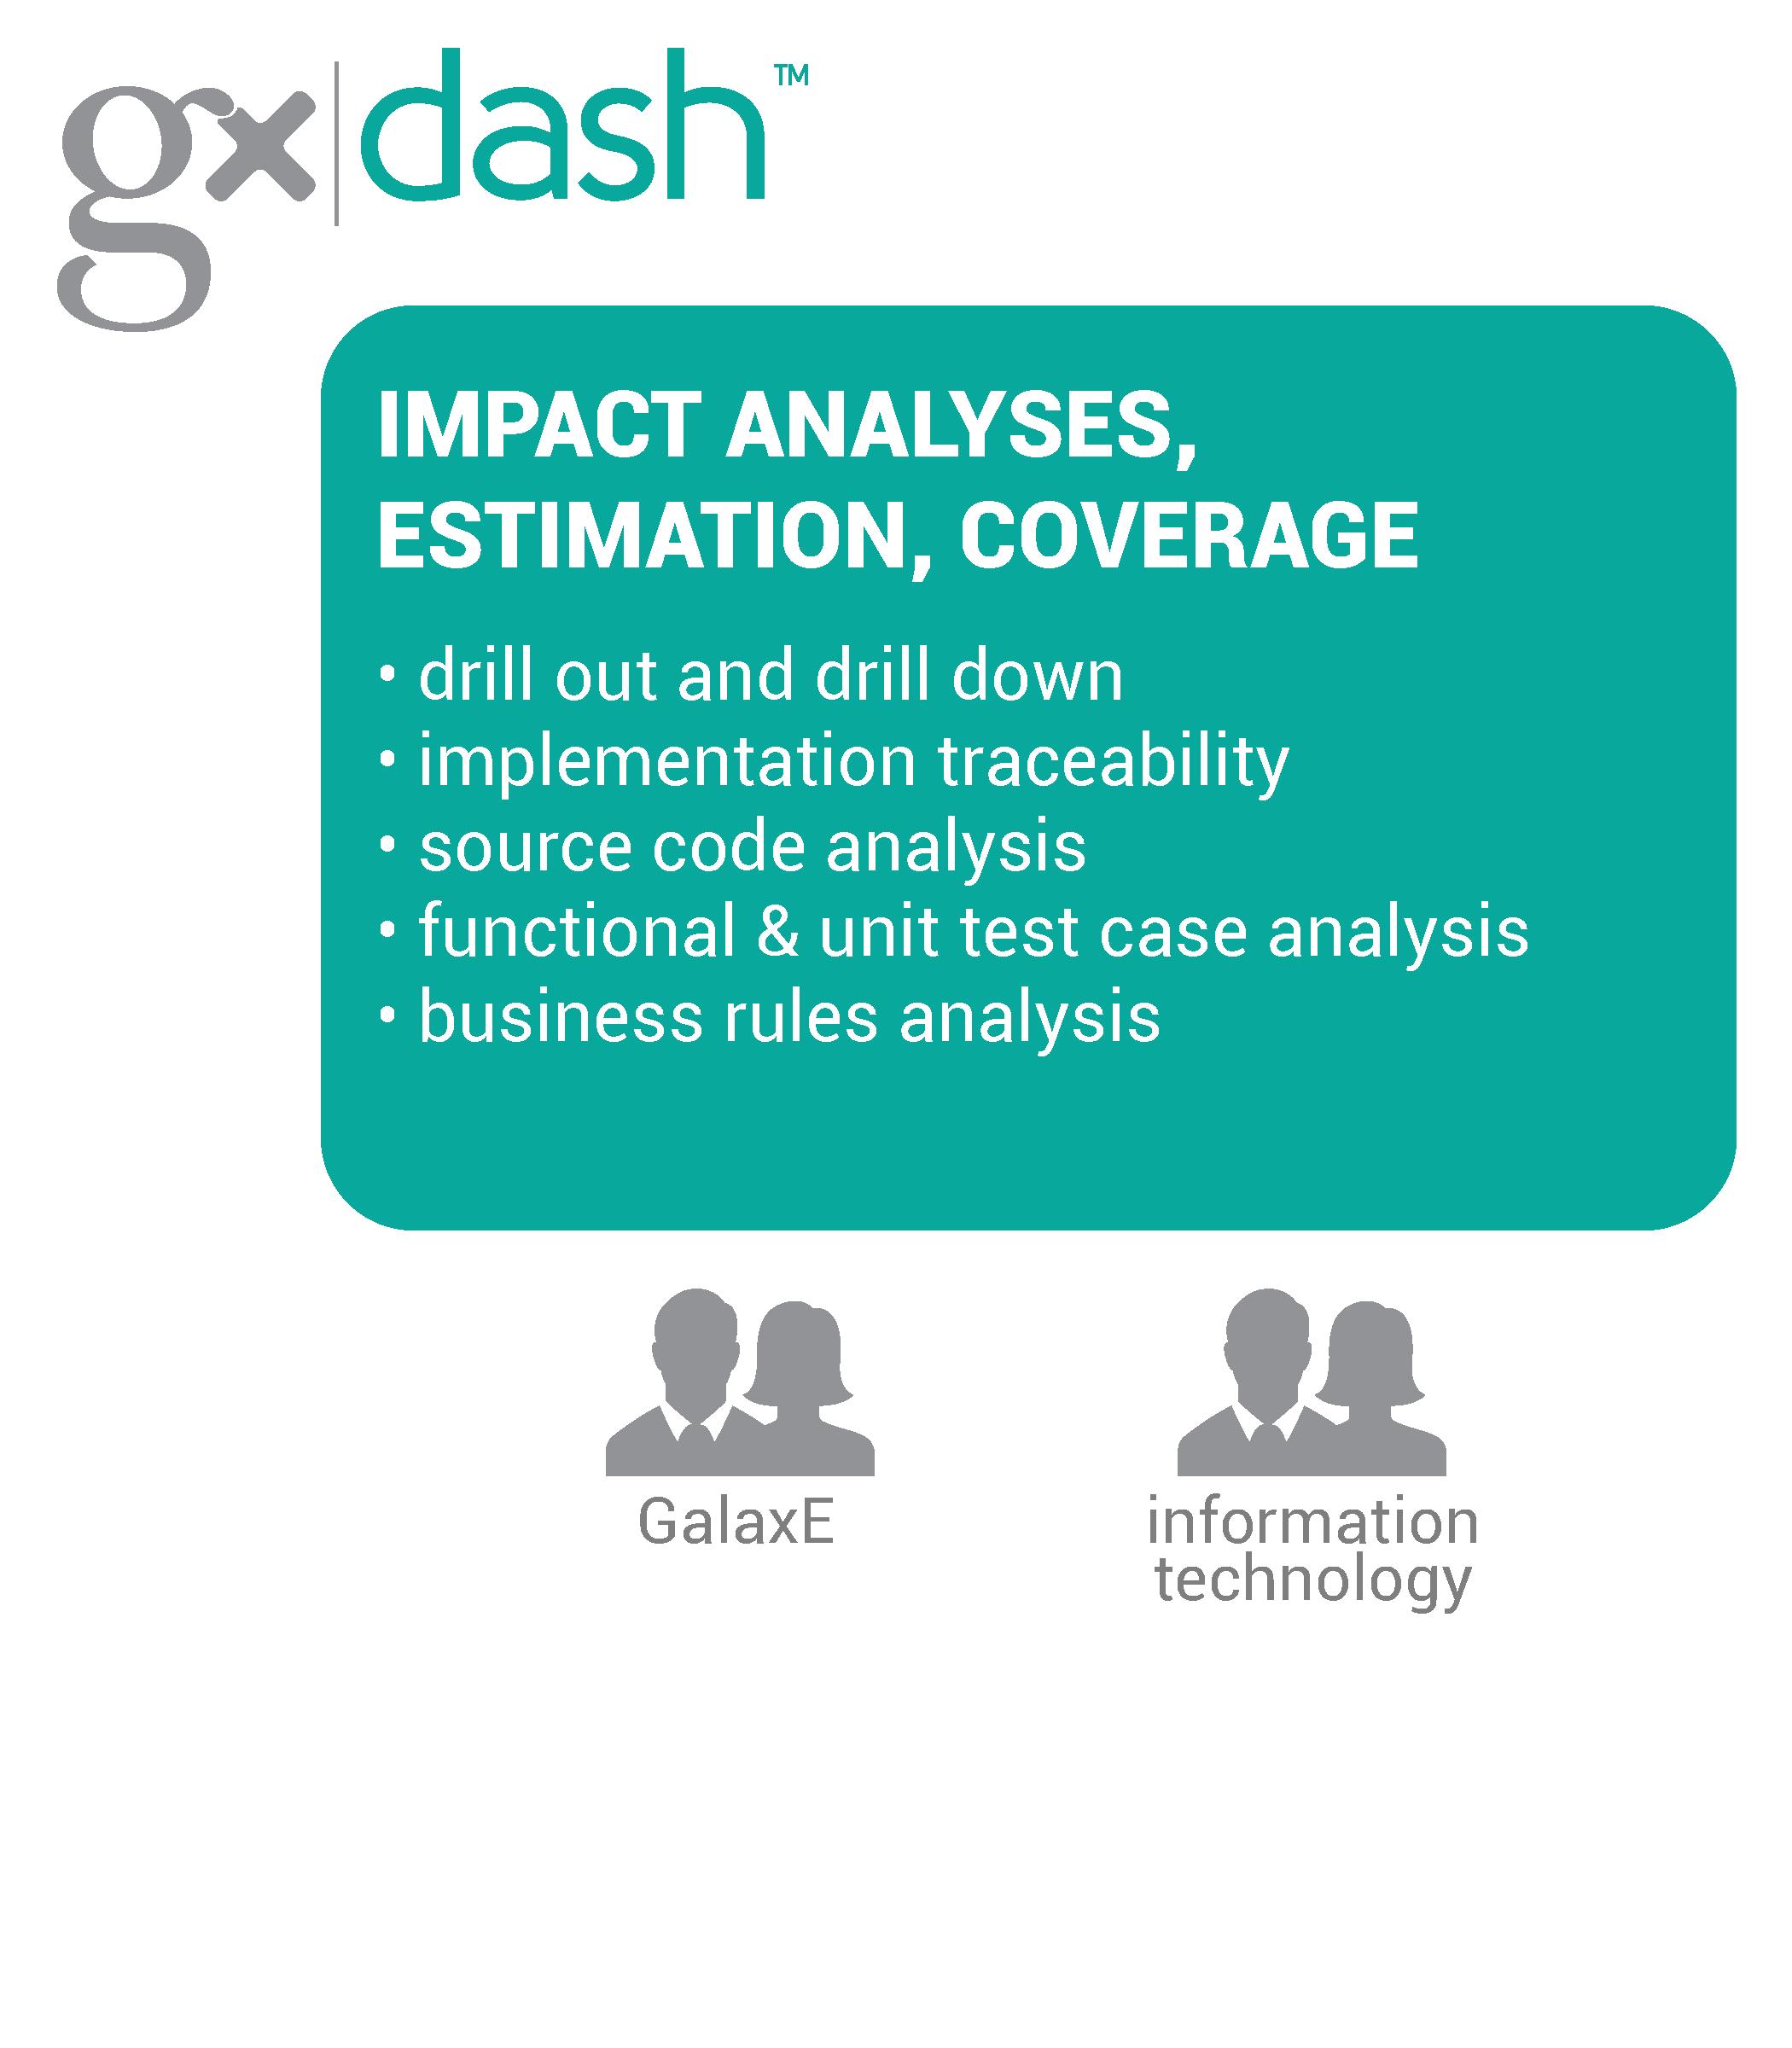 GxDash